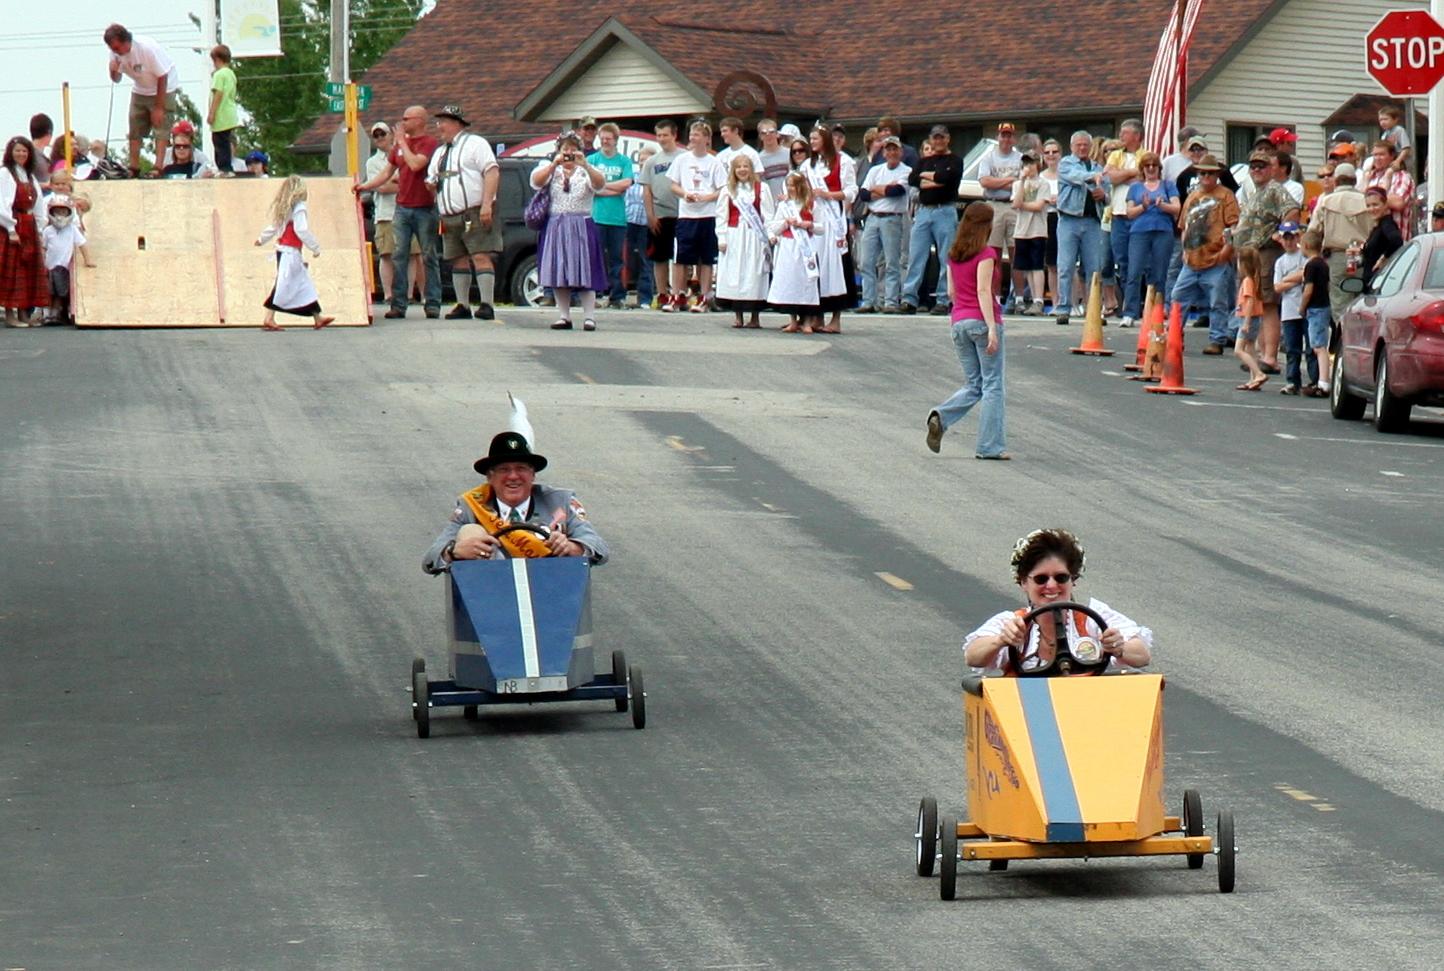 Minnesota Car Racing Events